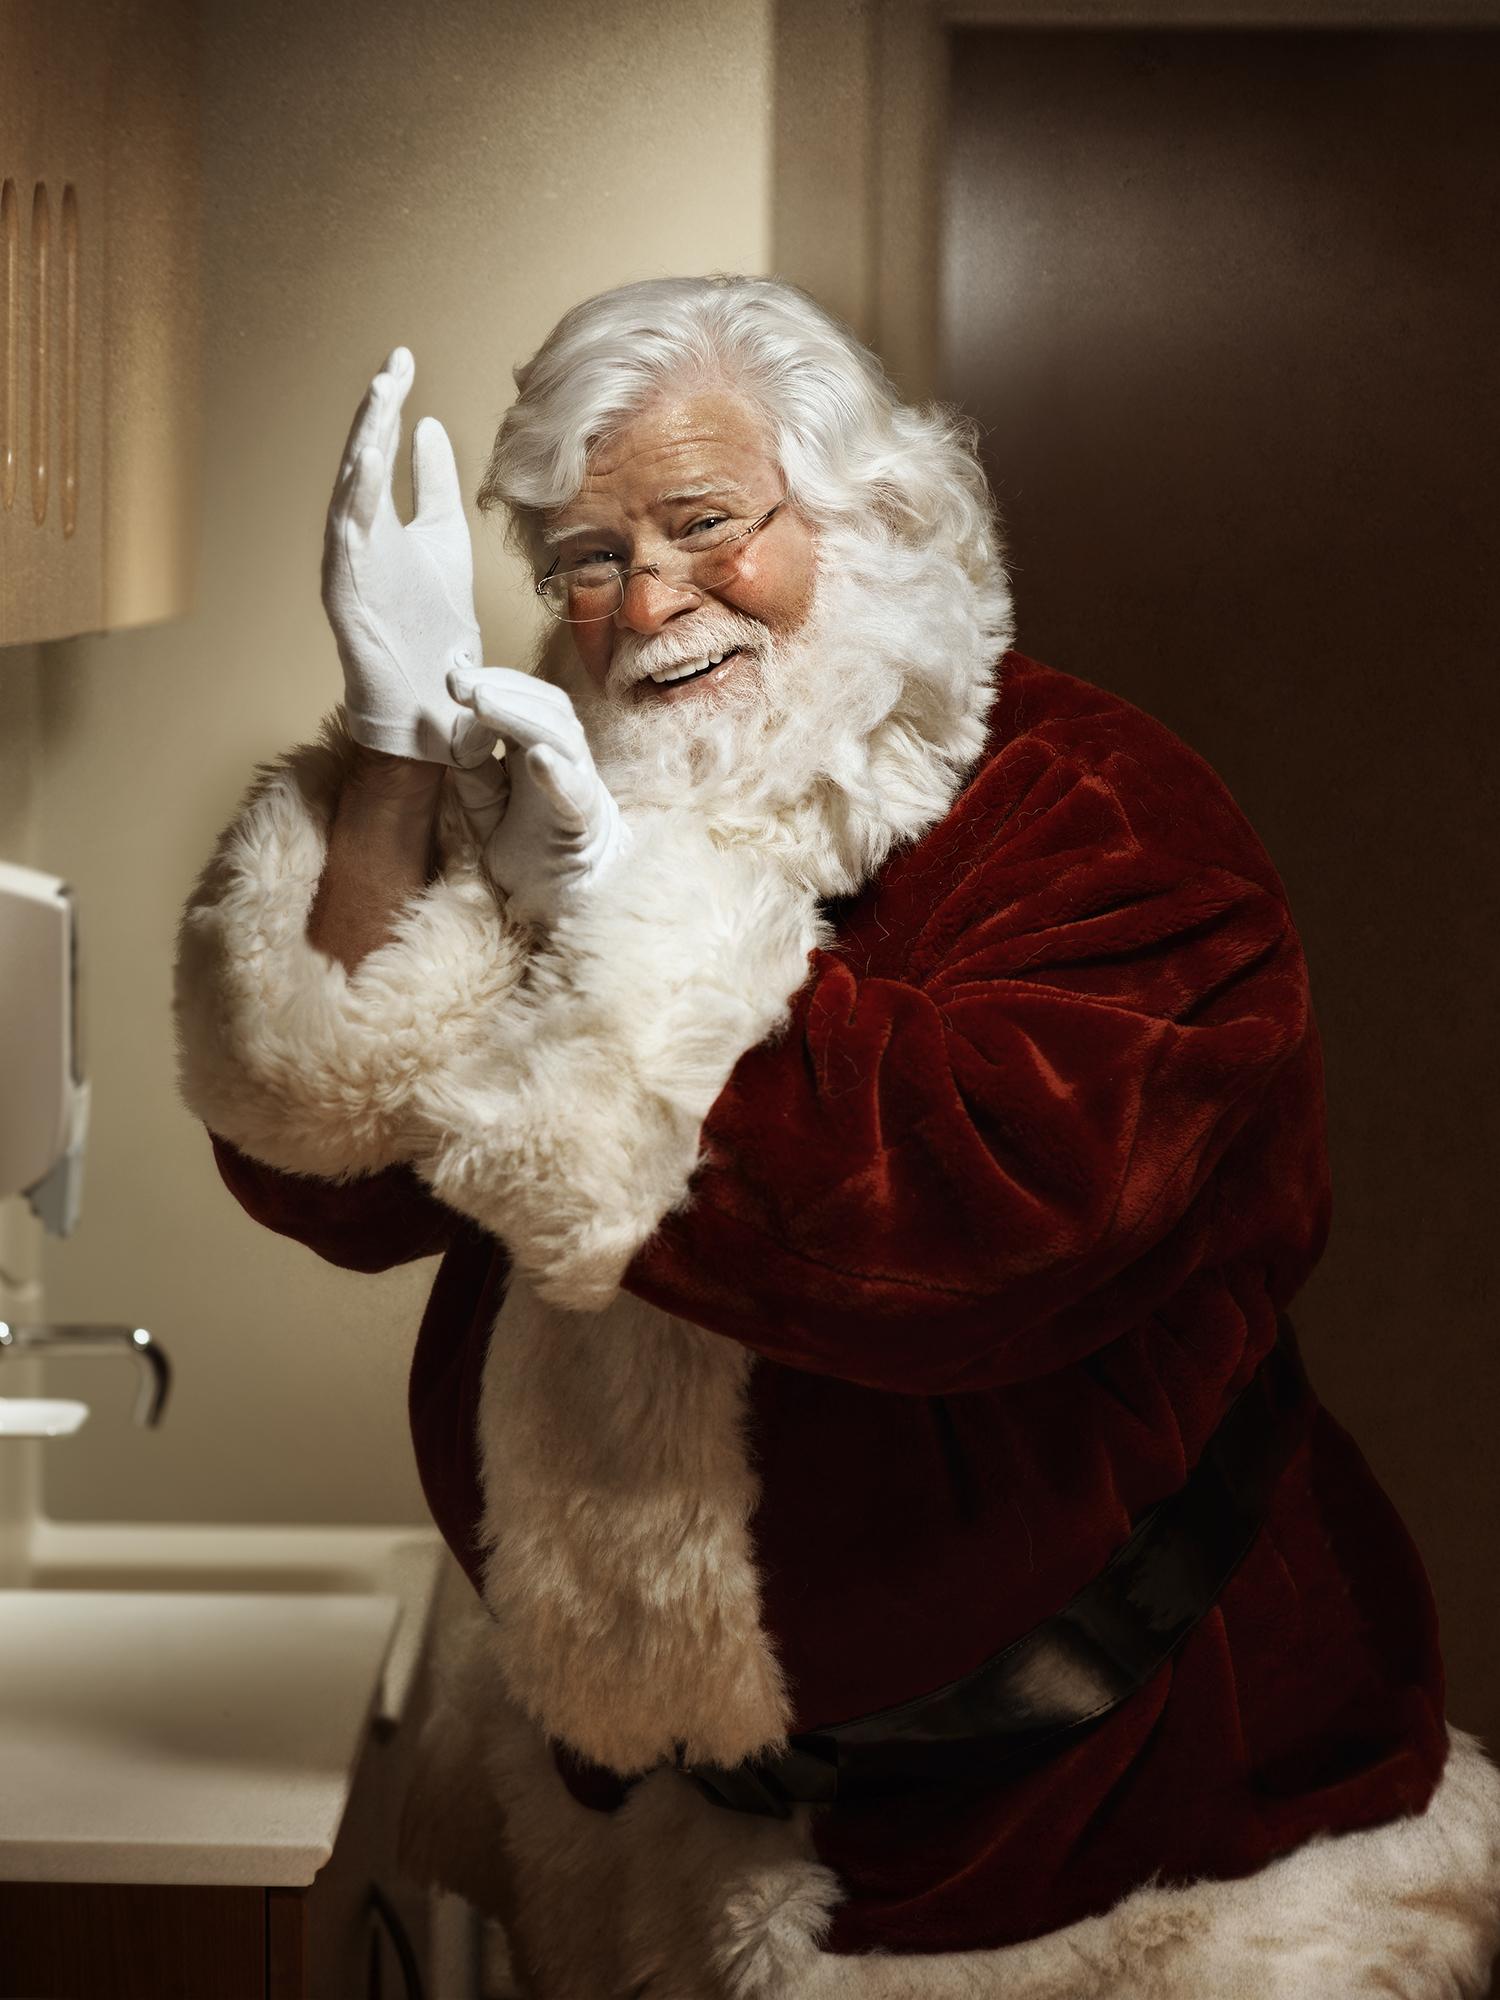 handwashing-052MF_2000px72cRs.jpg